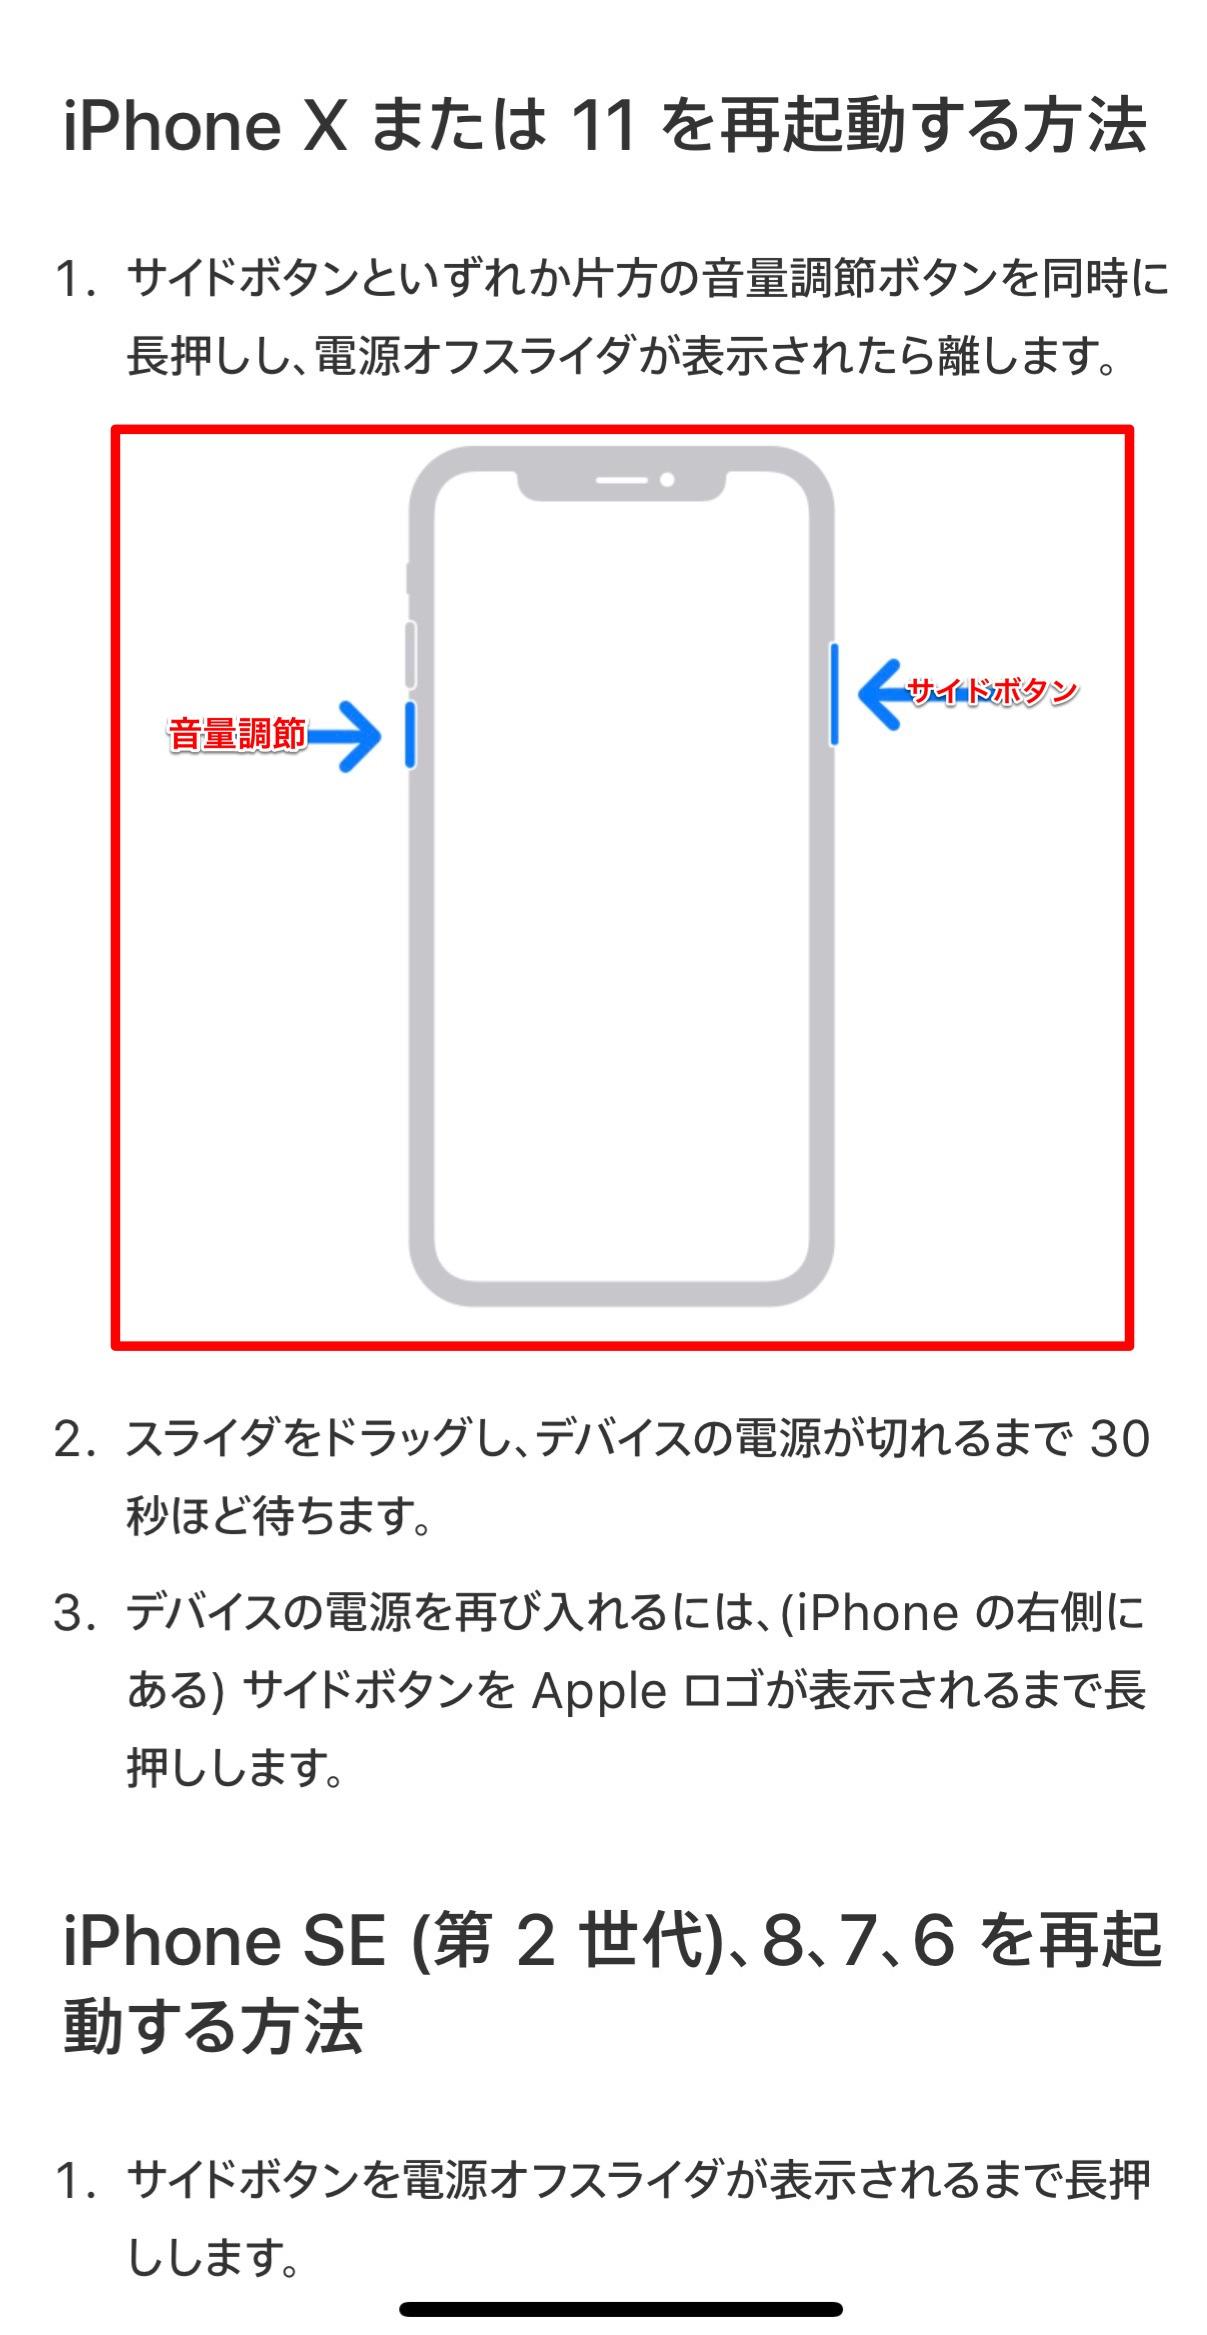 iPhoneでの再起動方法画像(公式)